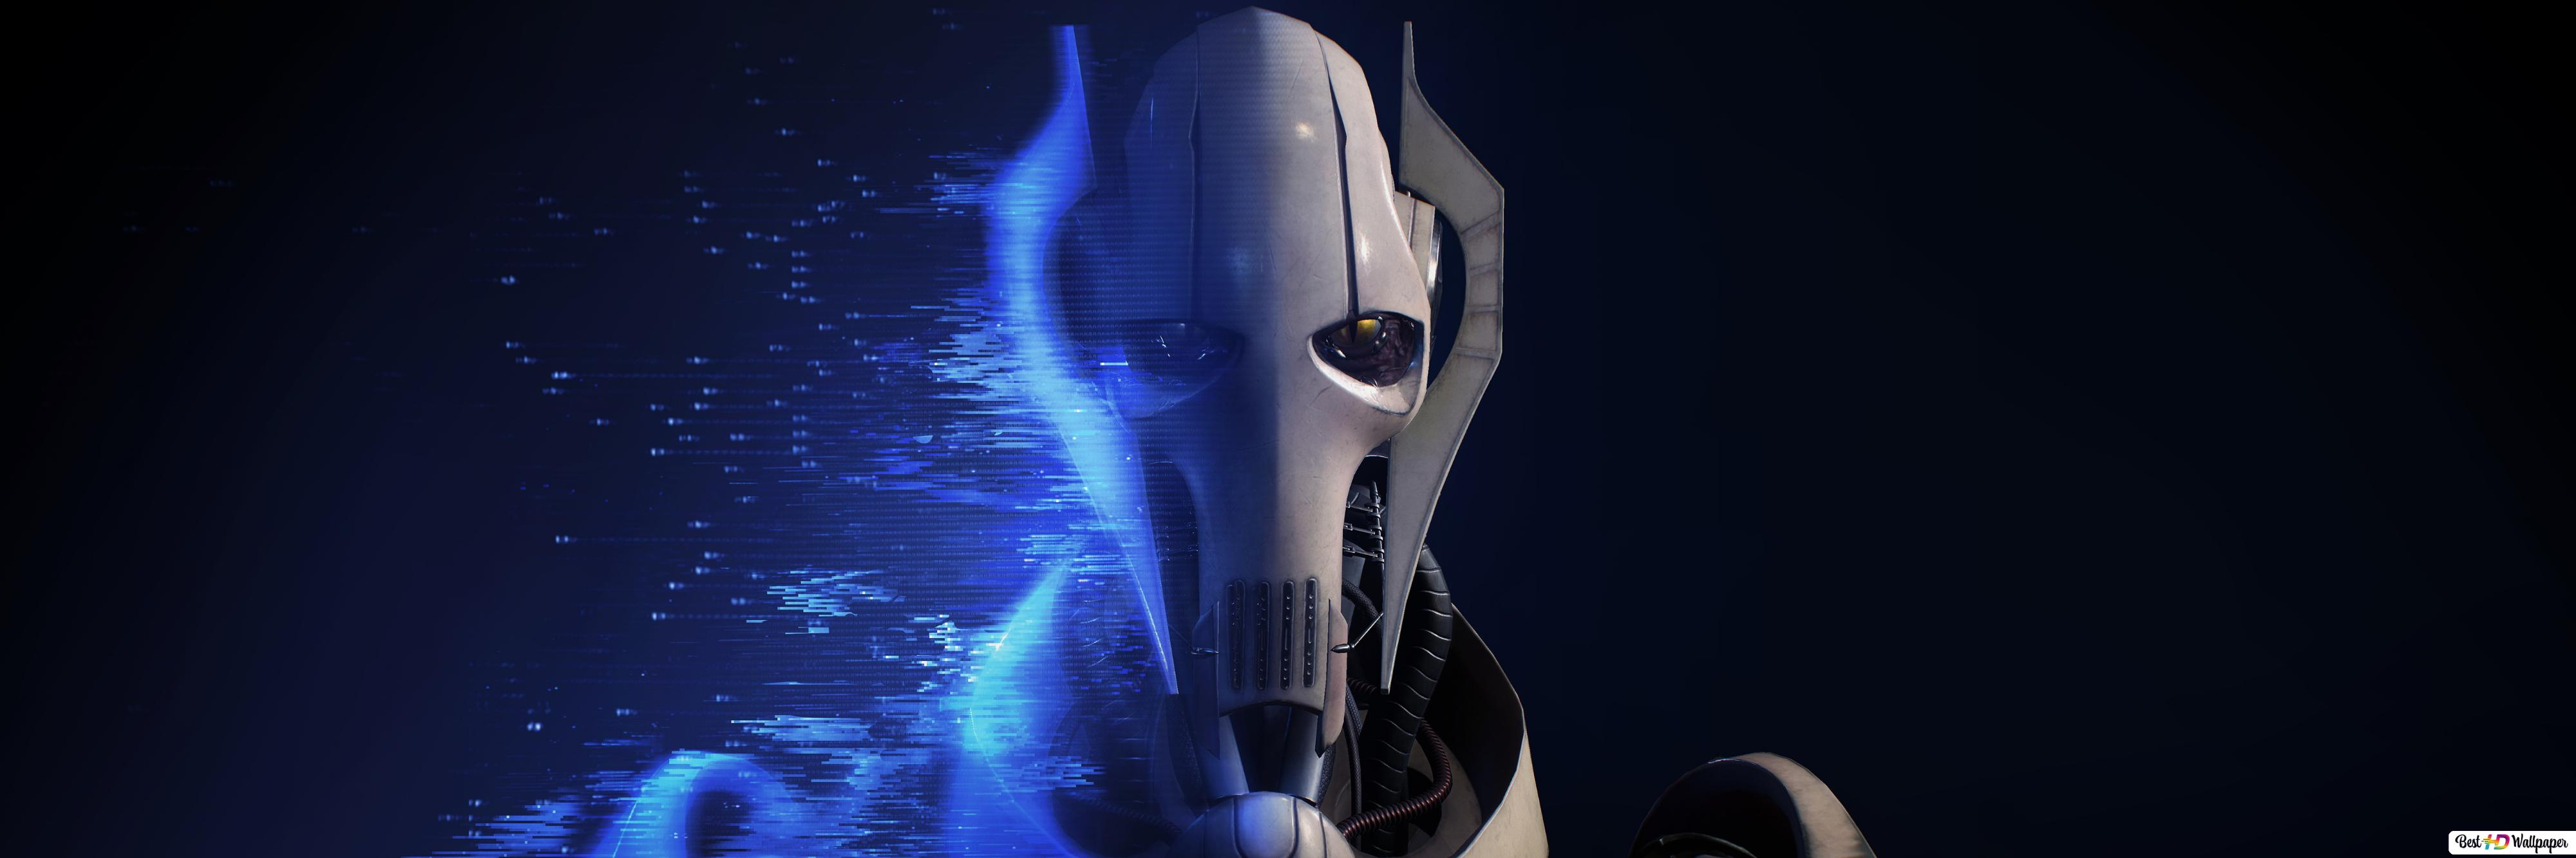 Star Wars Battlefront 2 Game Clone Trooper Grievous Hd Wallpaper Download